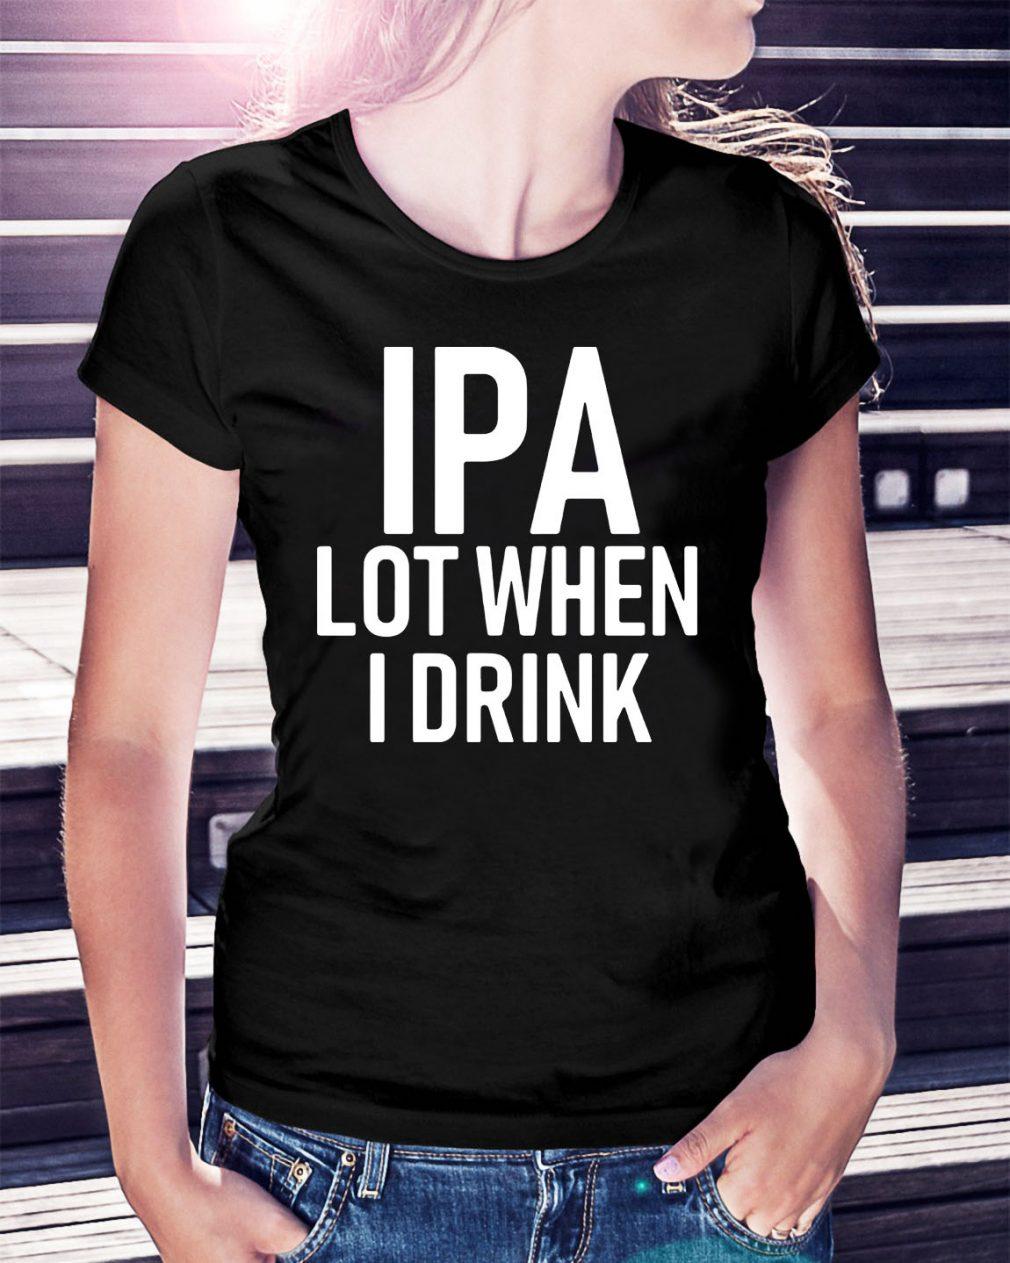 IPA lot when I drink Ladies Tee